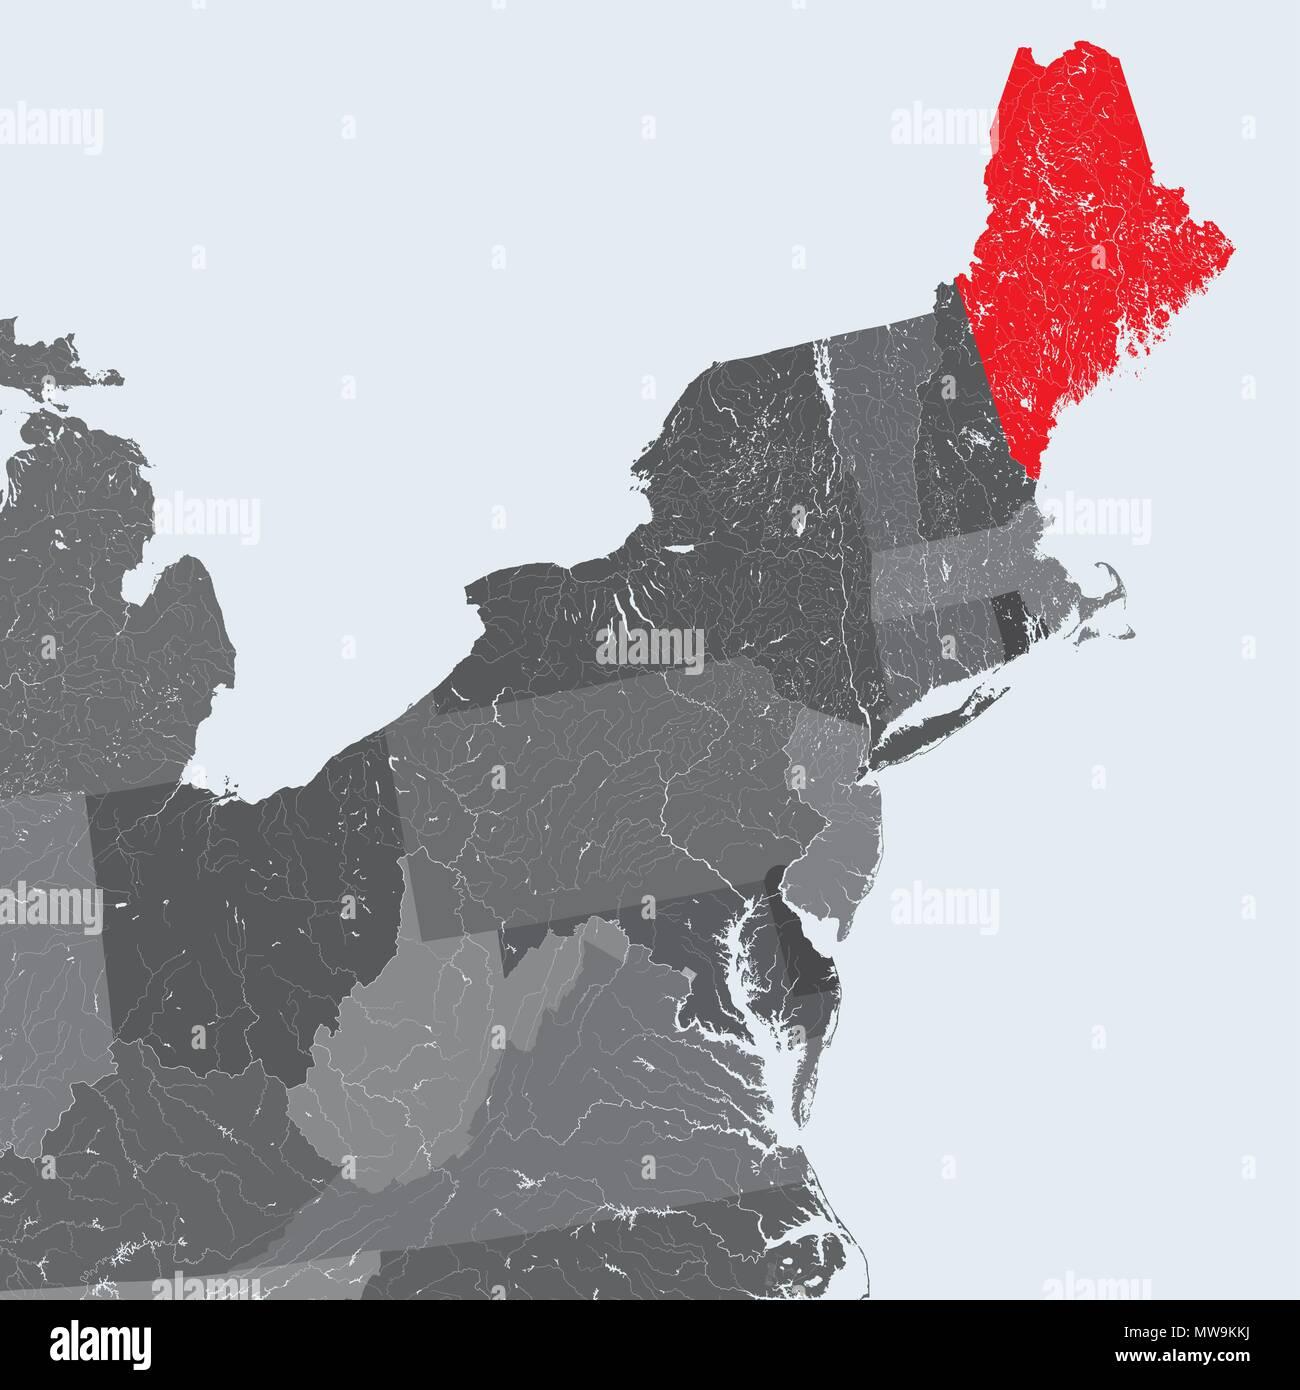 U.S. states - Northeastern United States - Maine - hand made ... on europe rivers map, latvia rivers map, indiana rivers map, zimbabwe rivers map, texas rivers map, paraguay rivers map, india rivers map, china rivers map, colorado rivers map, south america rivers map, washington rivers map, canada rivers map, ohio river map, mississippi rivers map, oregon rivers map, north america rivers map, southern africa rivers map, arkansas rivers map, idaho rivers map, east coast rivers map,